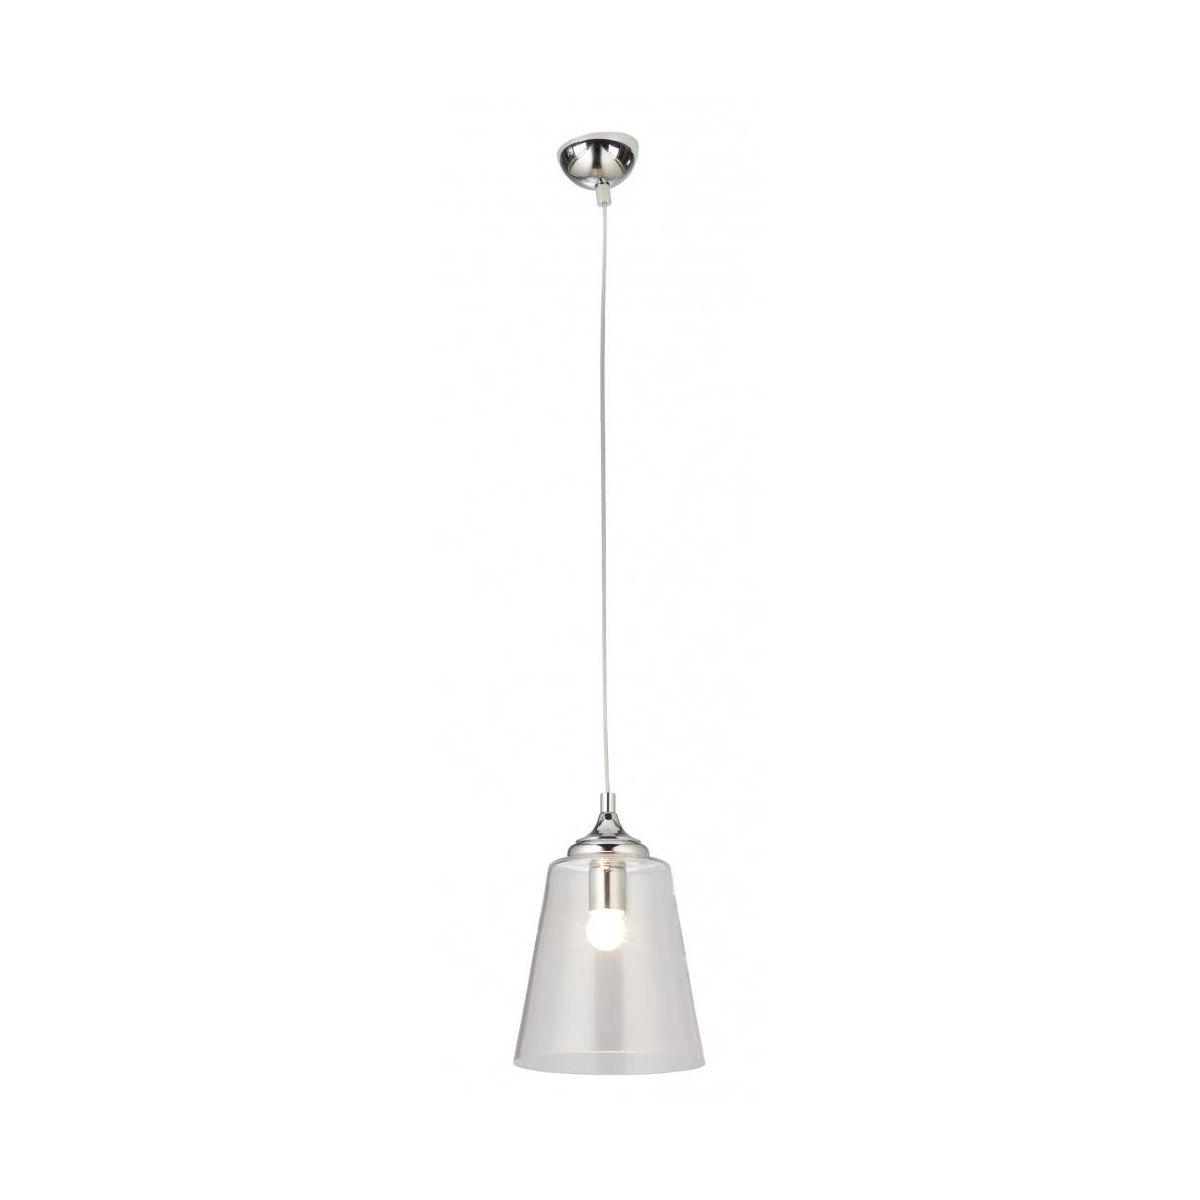 Lampa Sufitowa Led Leroy Merlin